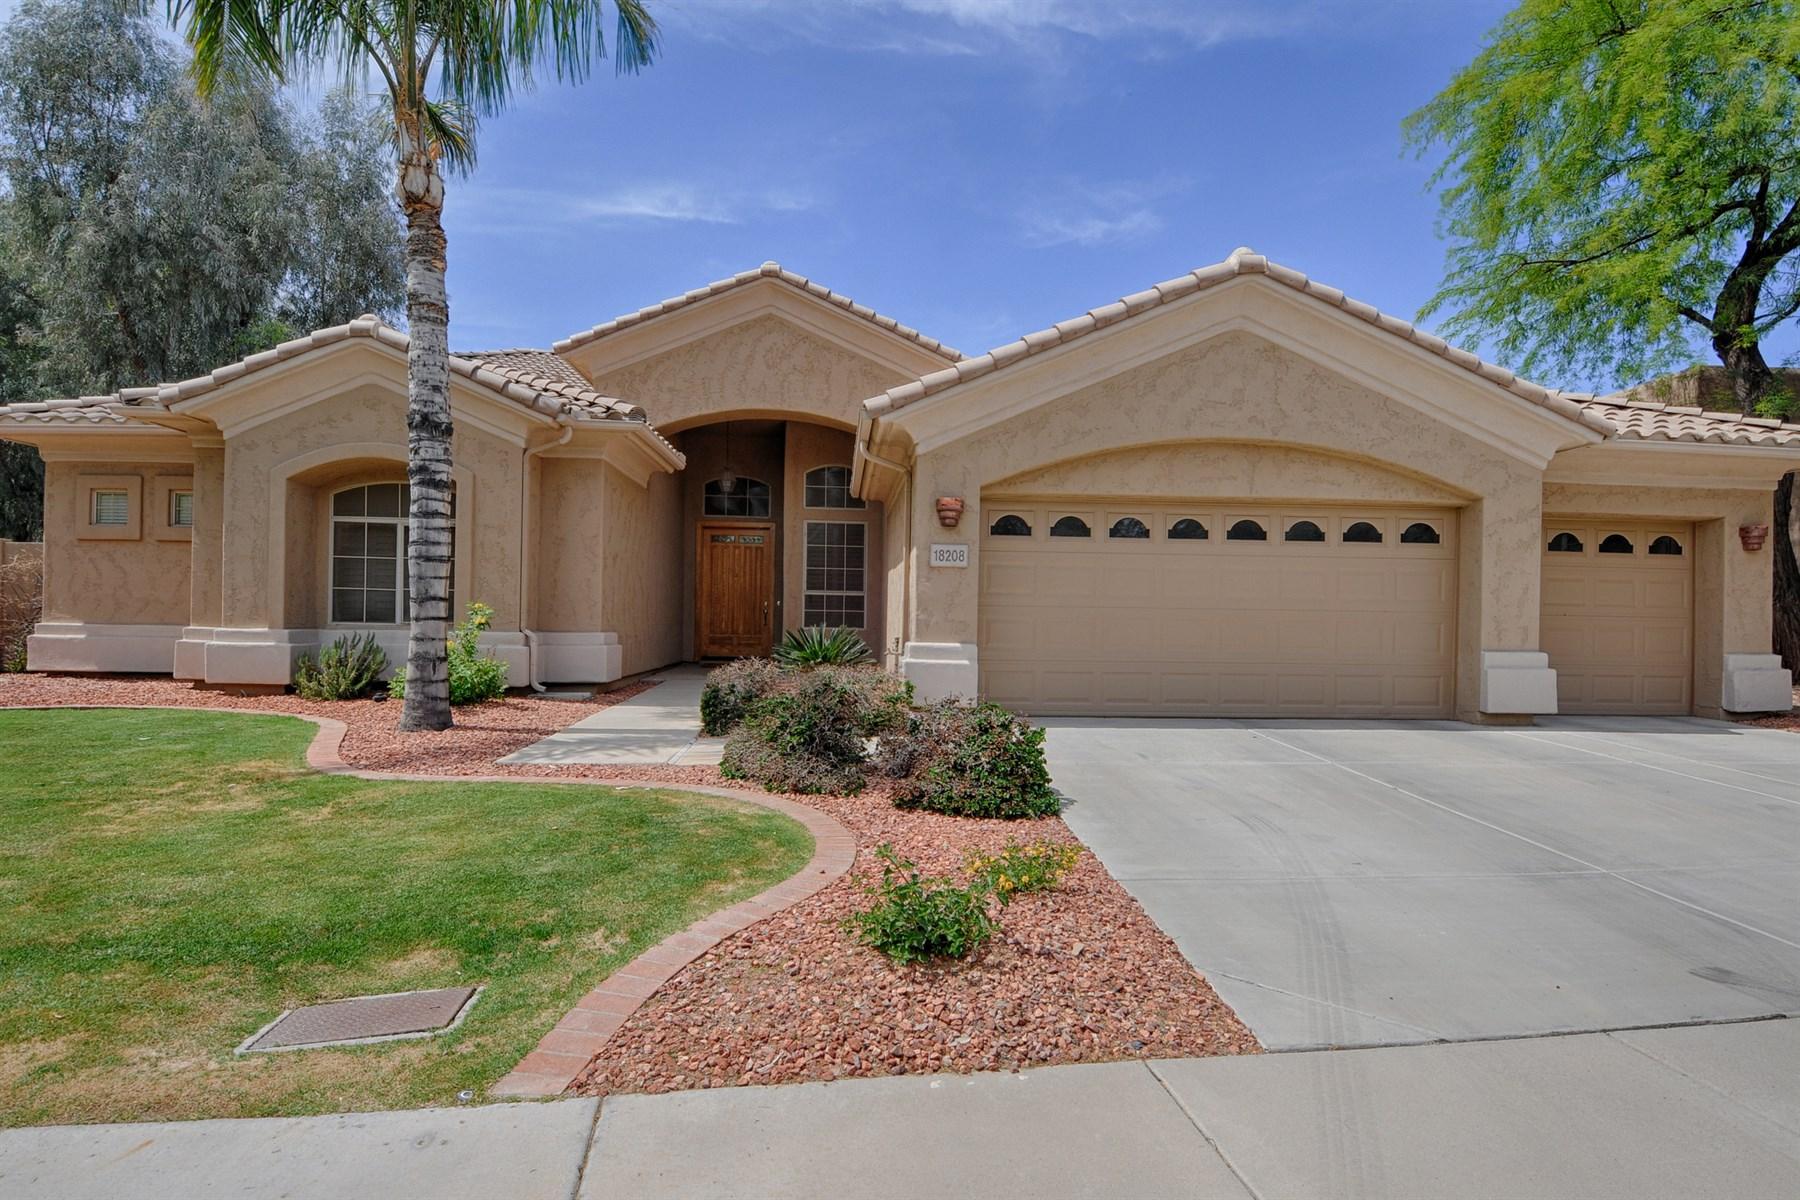 Vivienda unifamiliar por un Venta en Fabulous Turn-Key Basement Home in Triple Crown 18208 N 50th Street Scottsdale, Arizona 85254 Estados Unidos